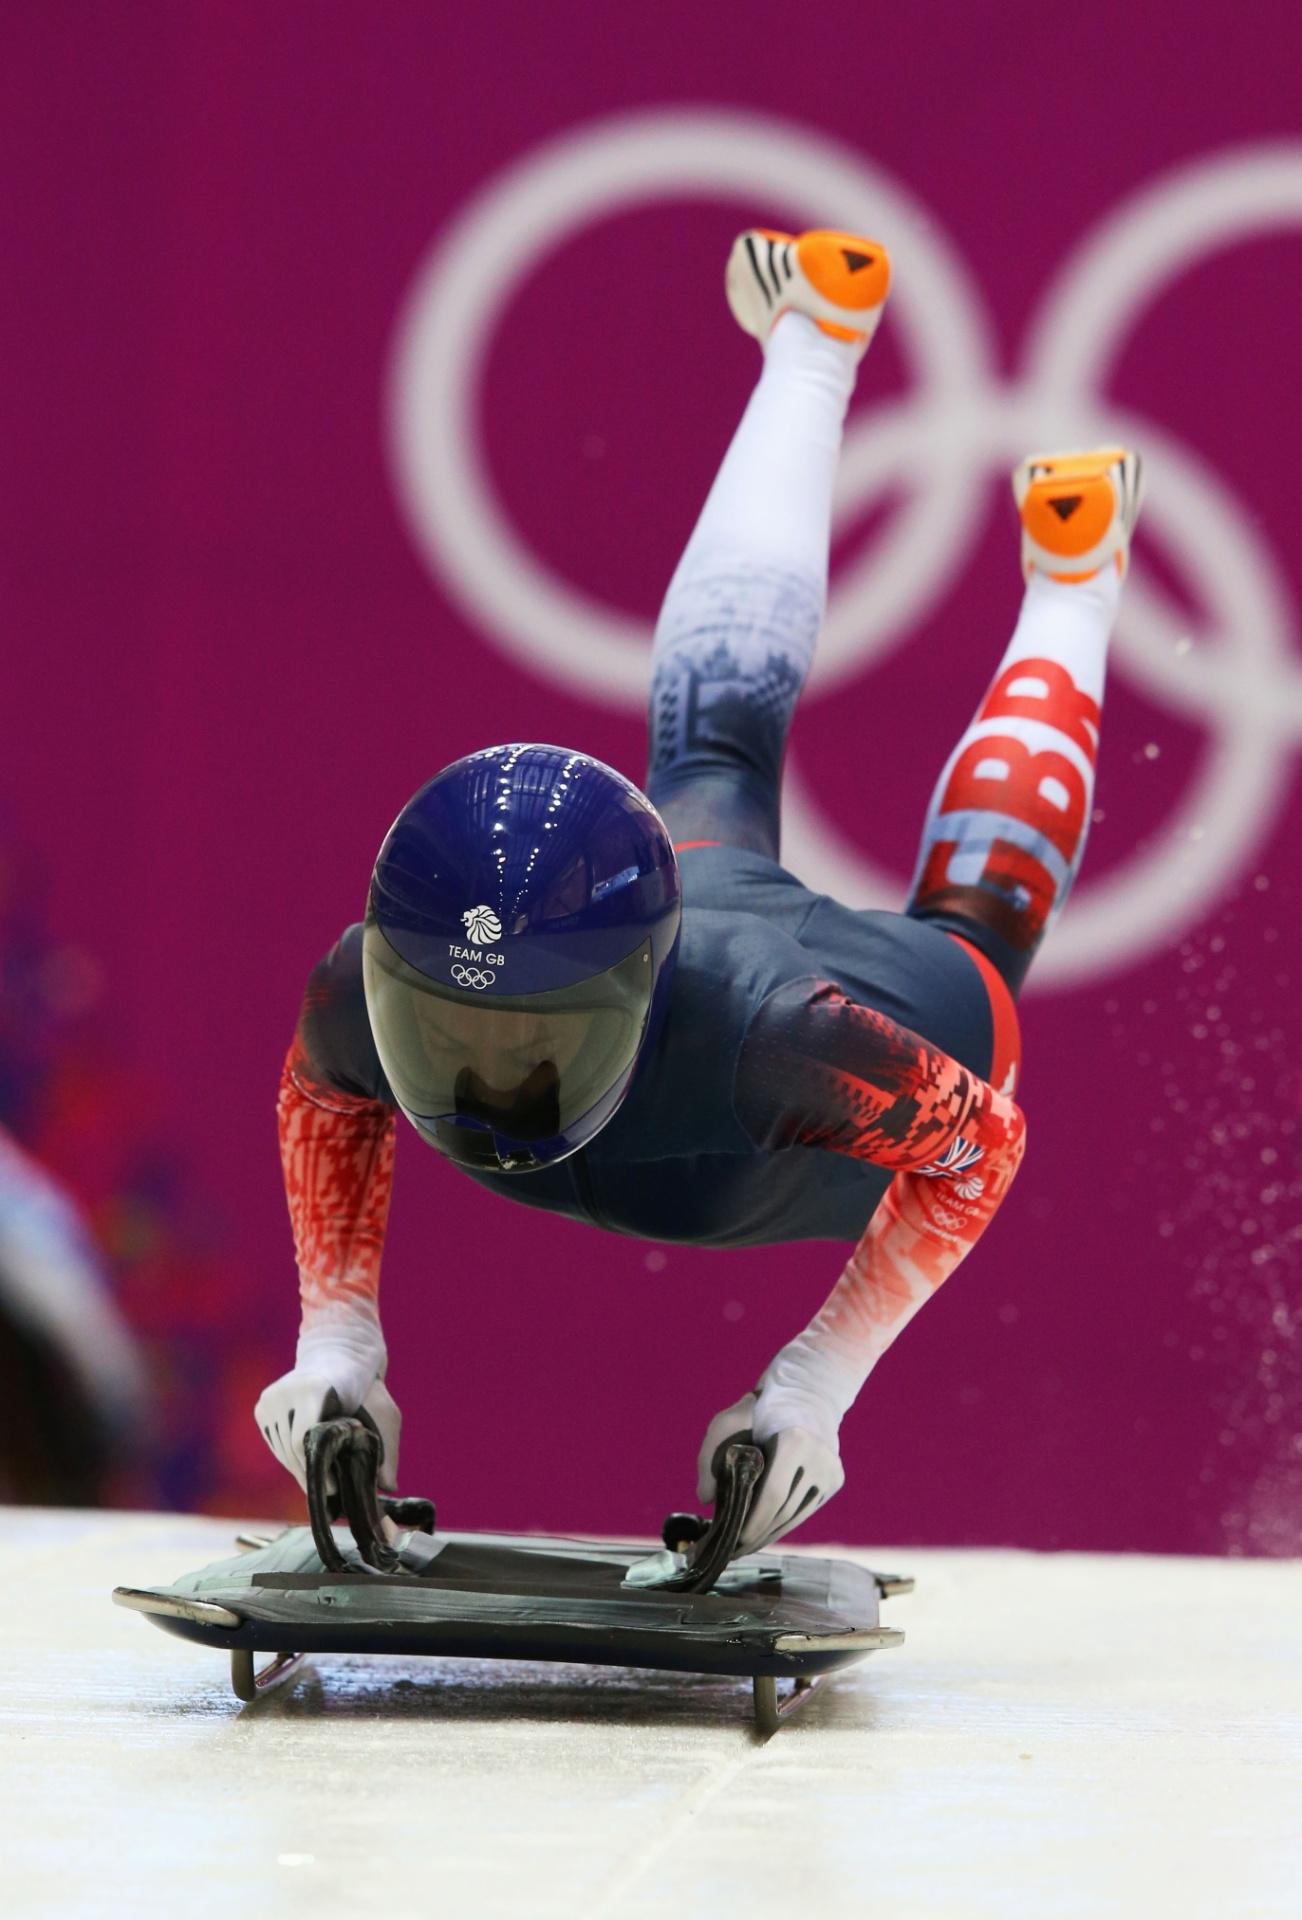 09.02.2014 - Britânico Shelley Rudman voa para pegar impulso na prova de skeleton